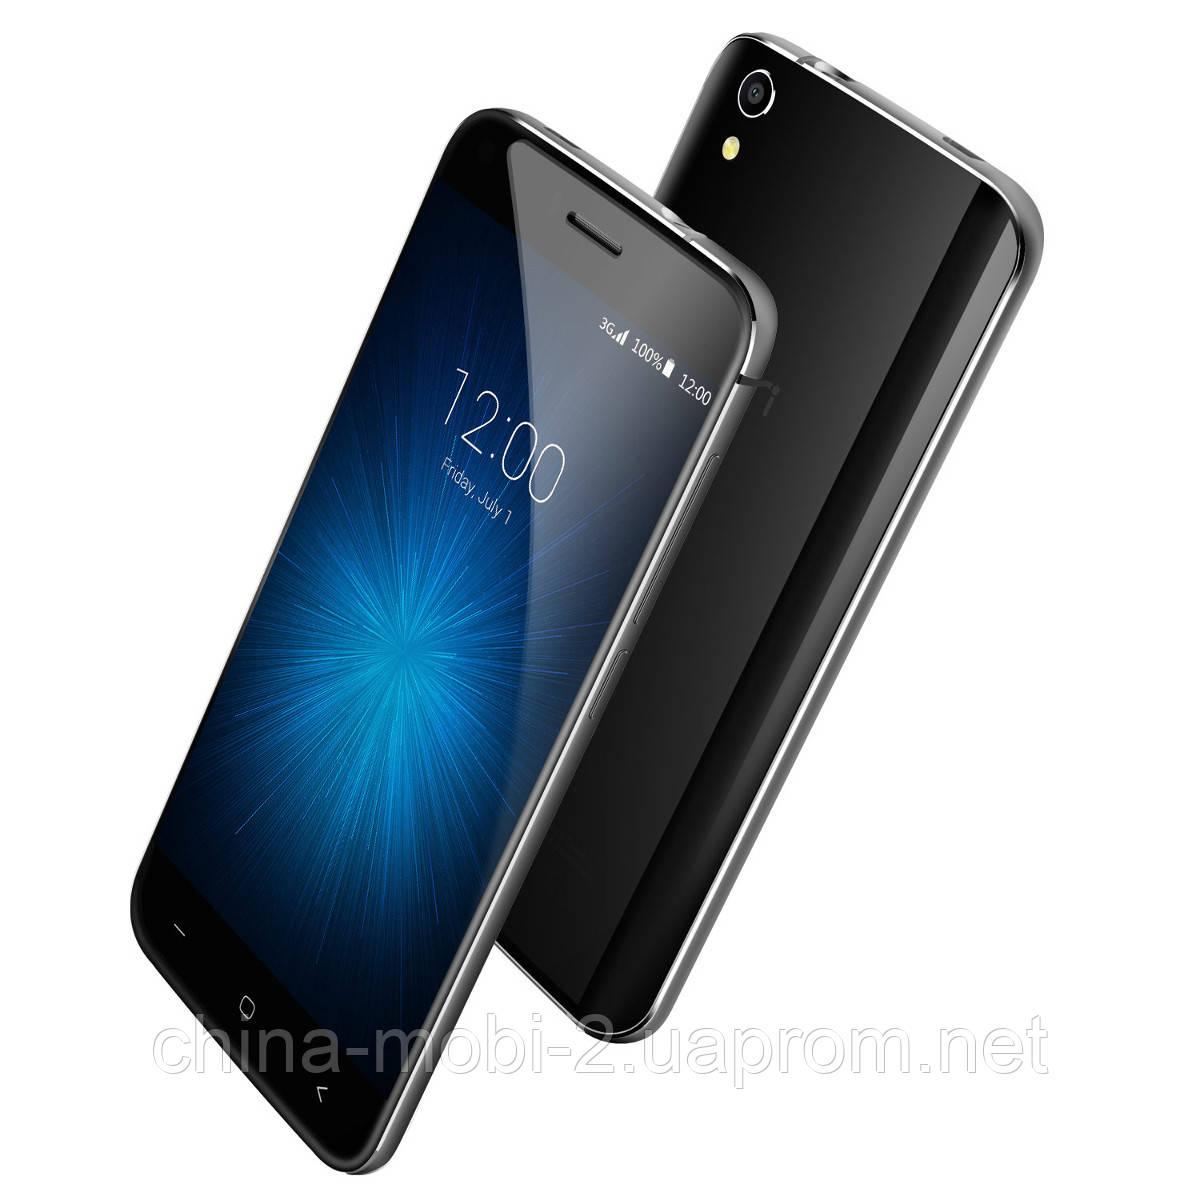 Смартфон UMI London  8GB  Black '